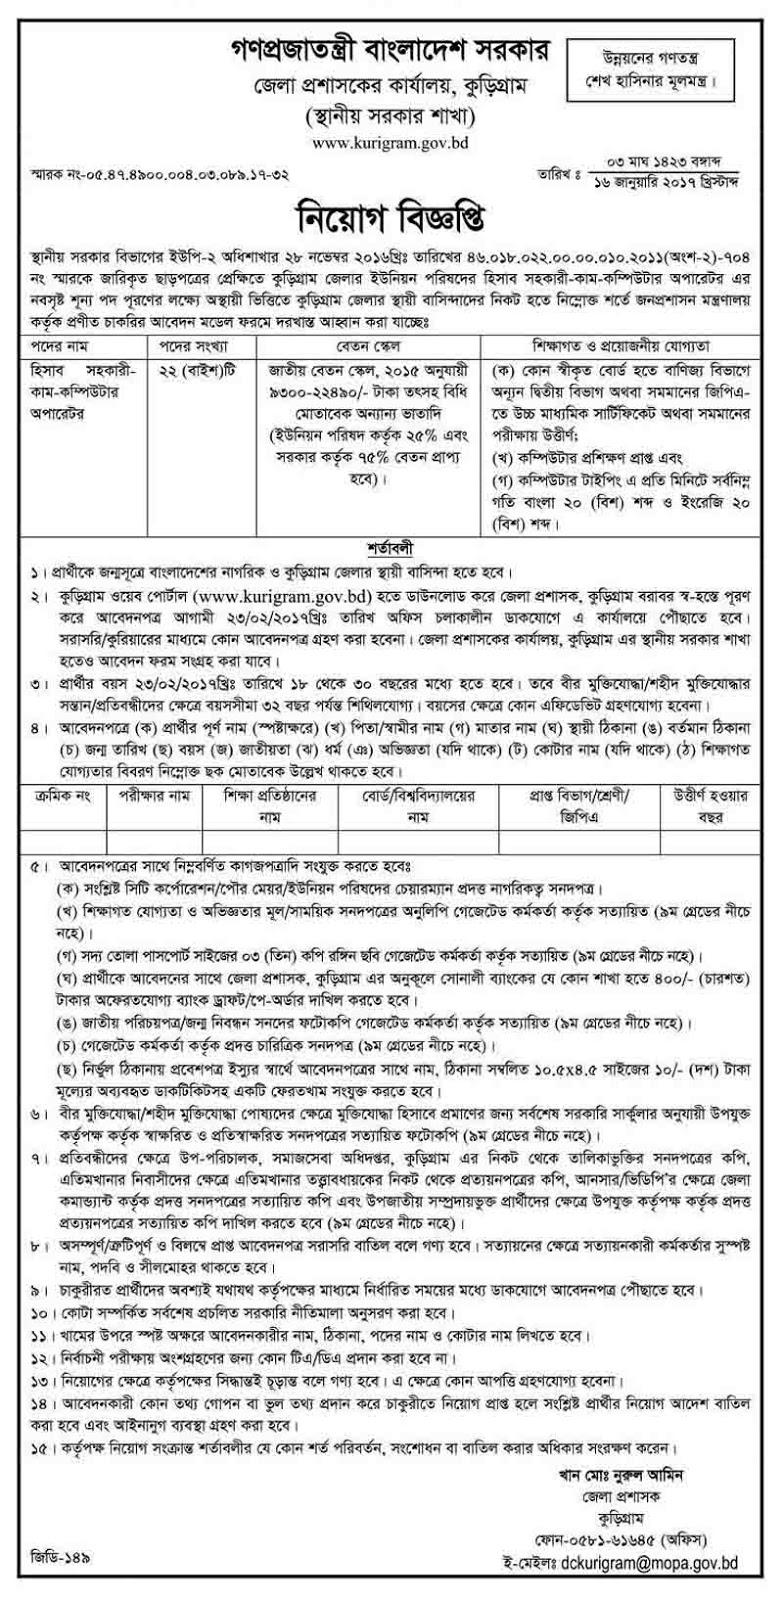 Rajbari district union councils' accounts assistant cum computer operator appointed circular